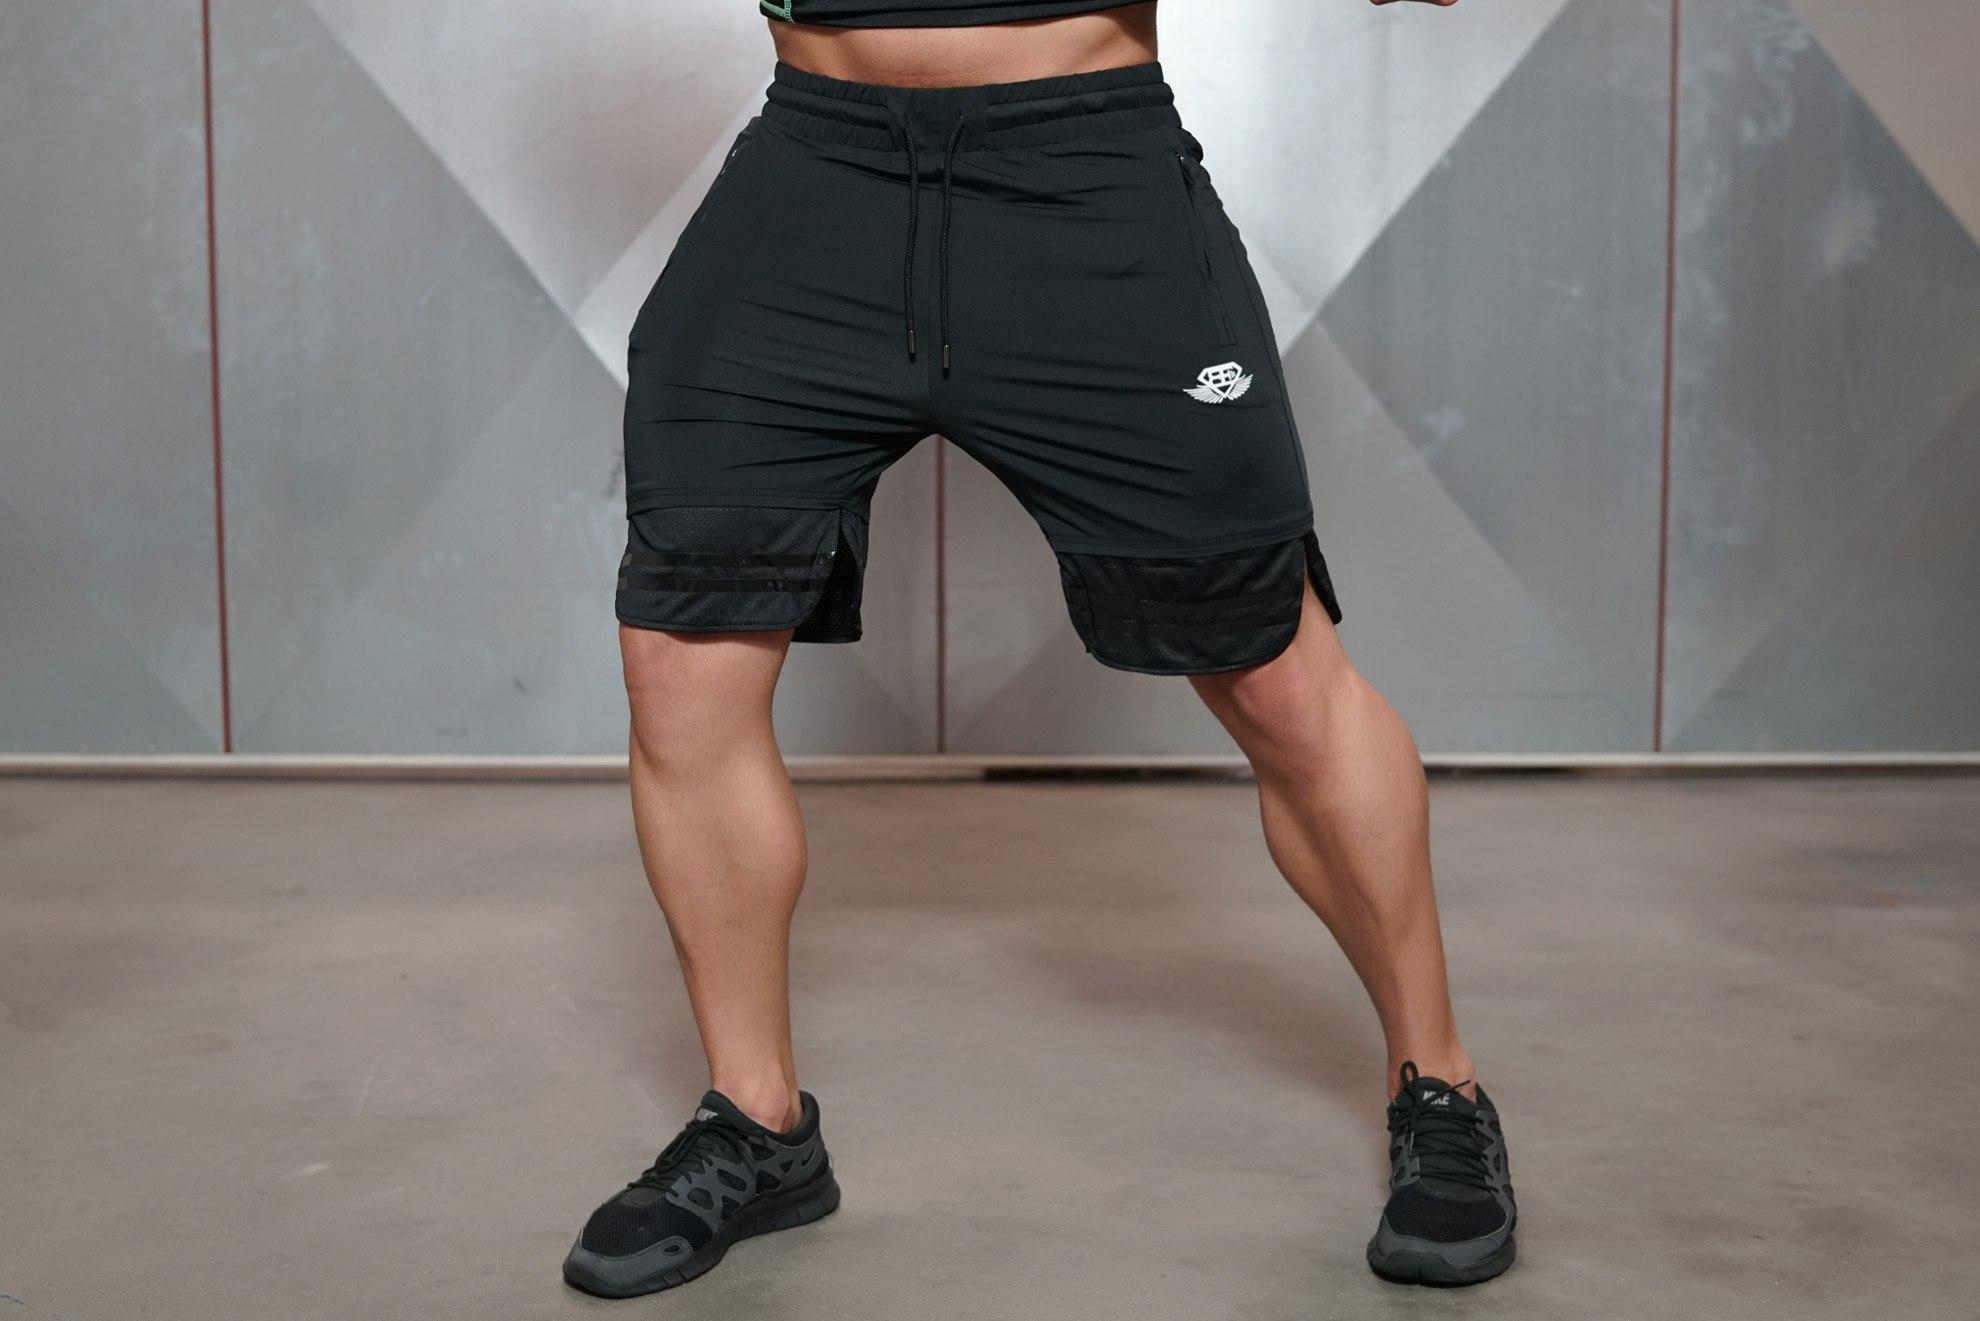 nox shorts black body engineers international shop. Black Bedroom Furniture Sets. Home Design Ideas